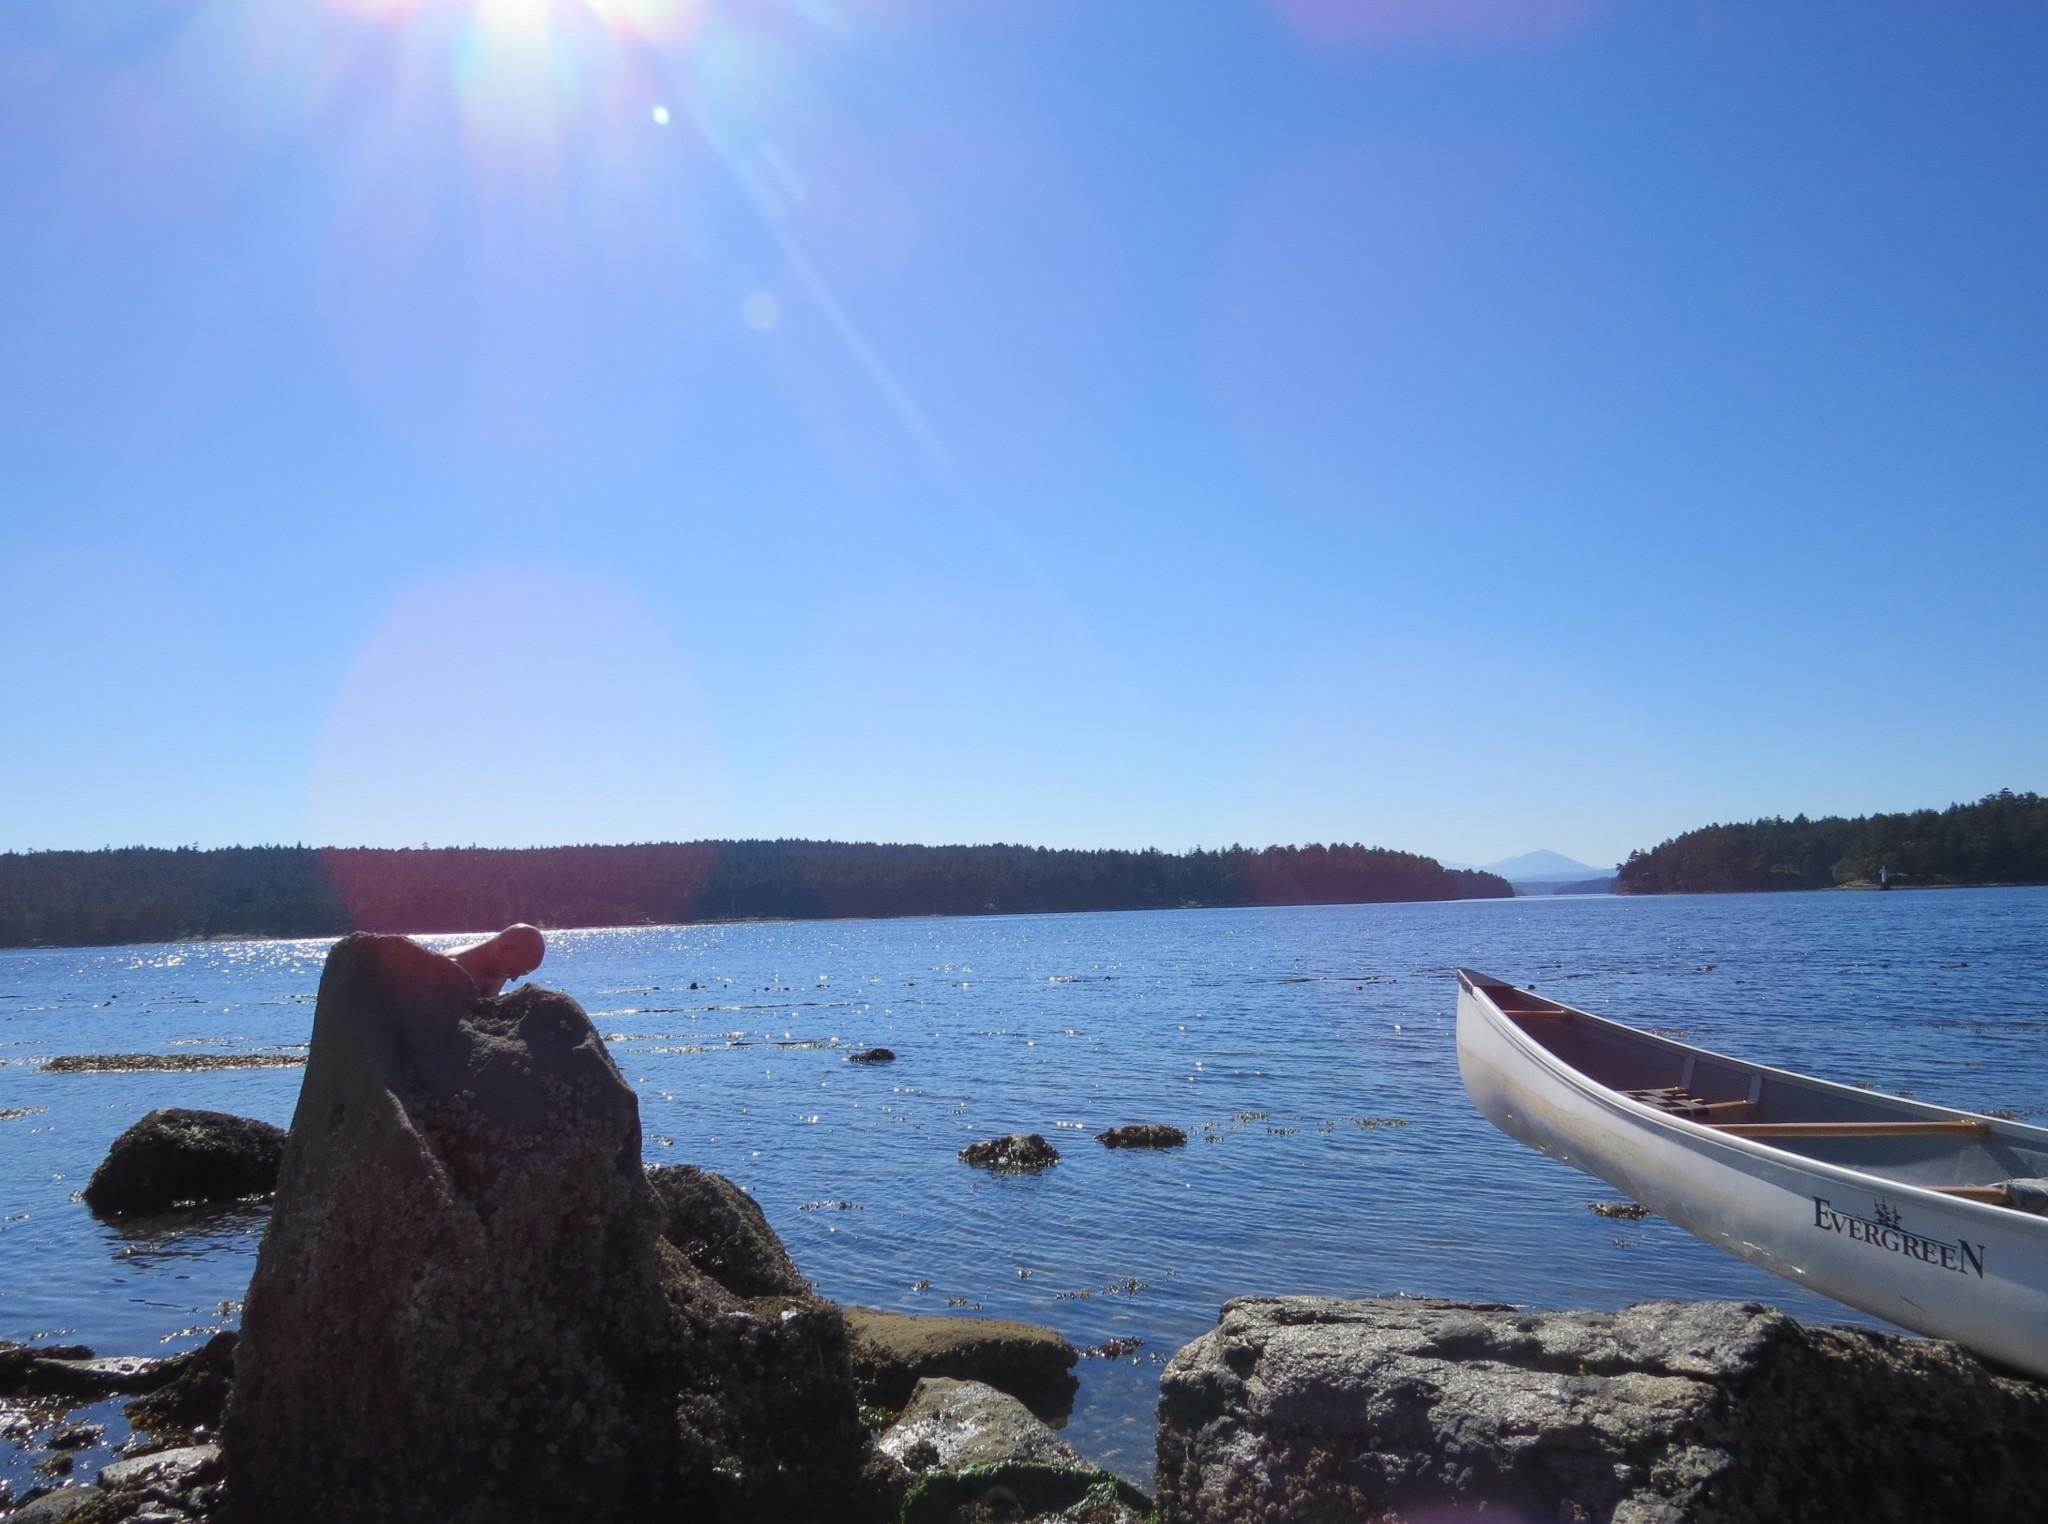 Canoe and Gabriola Island coastline